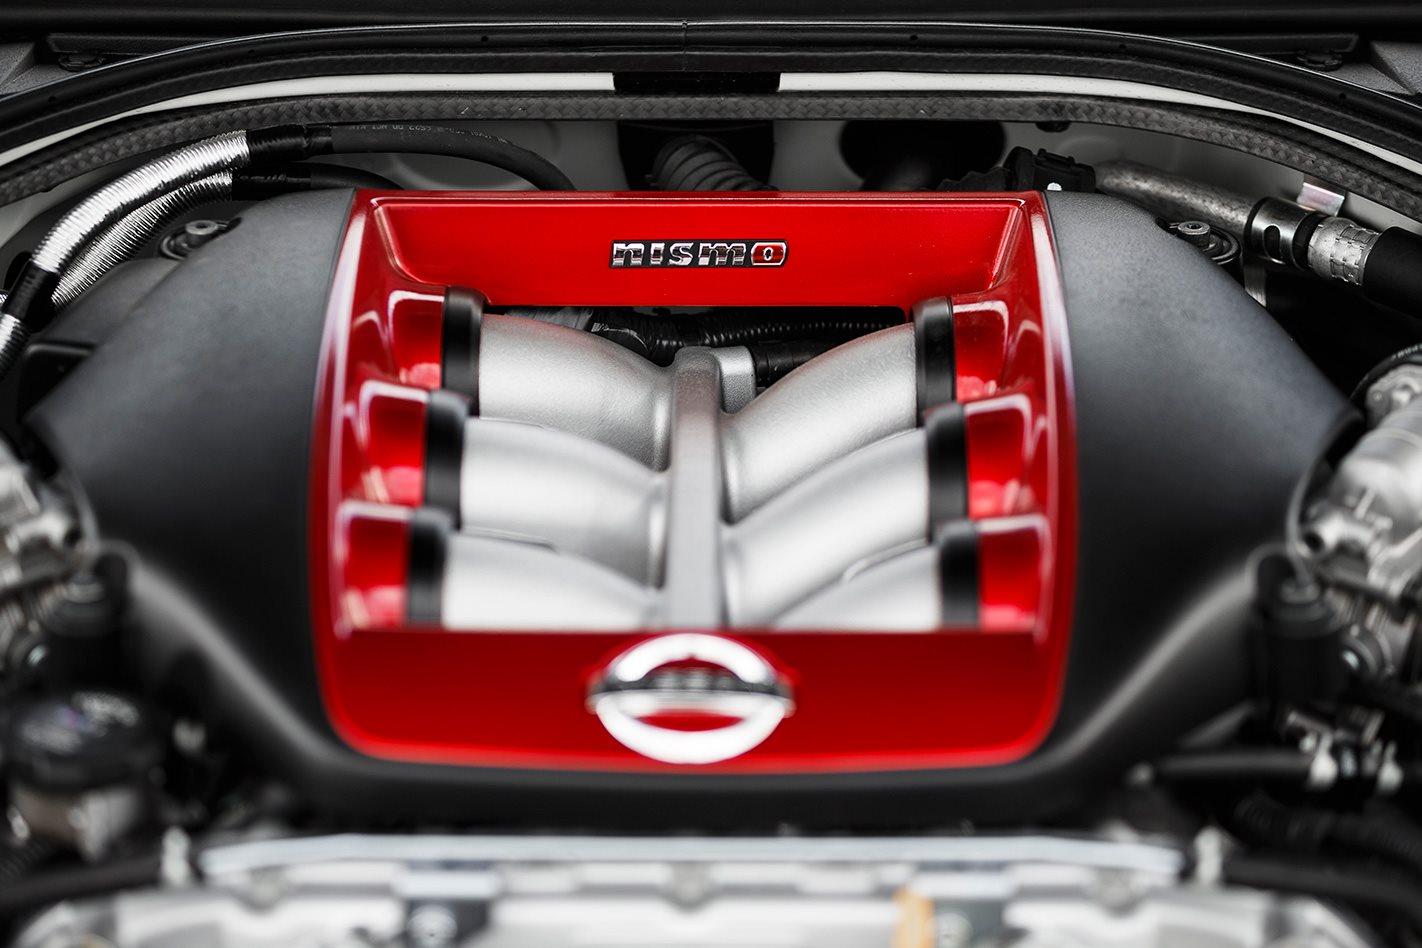 2017 Nissan GT-R NISMO engine valves.jpg